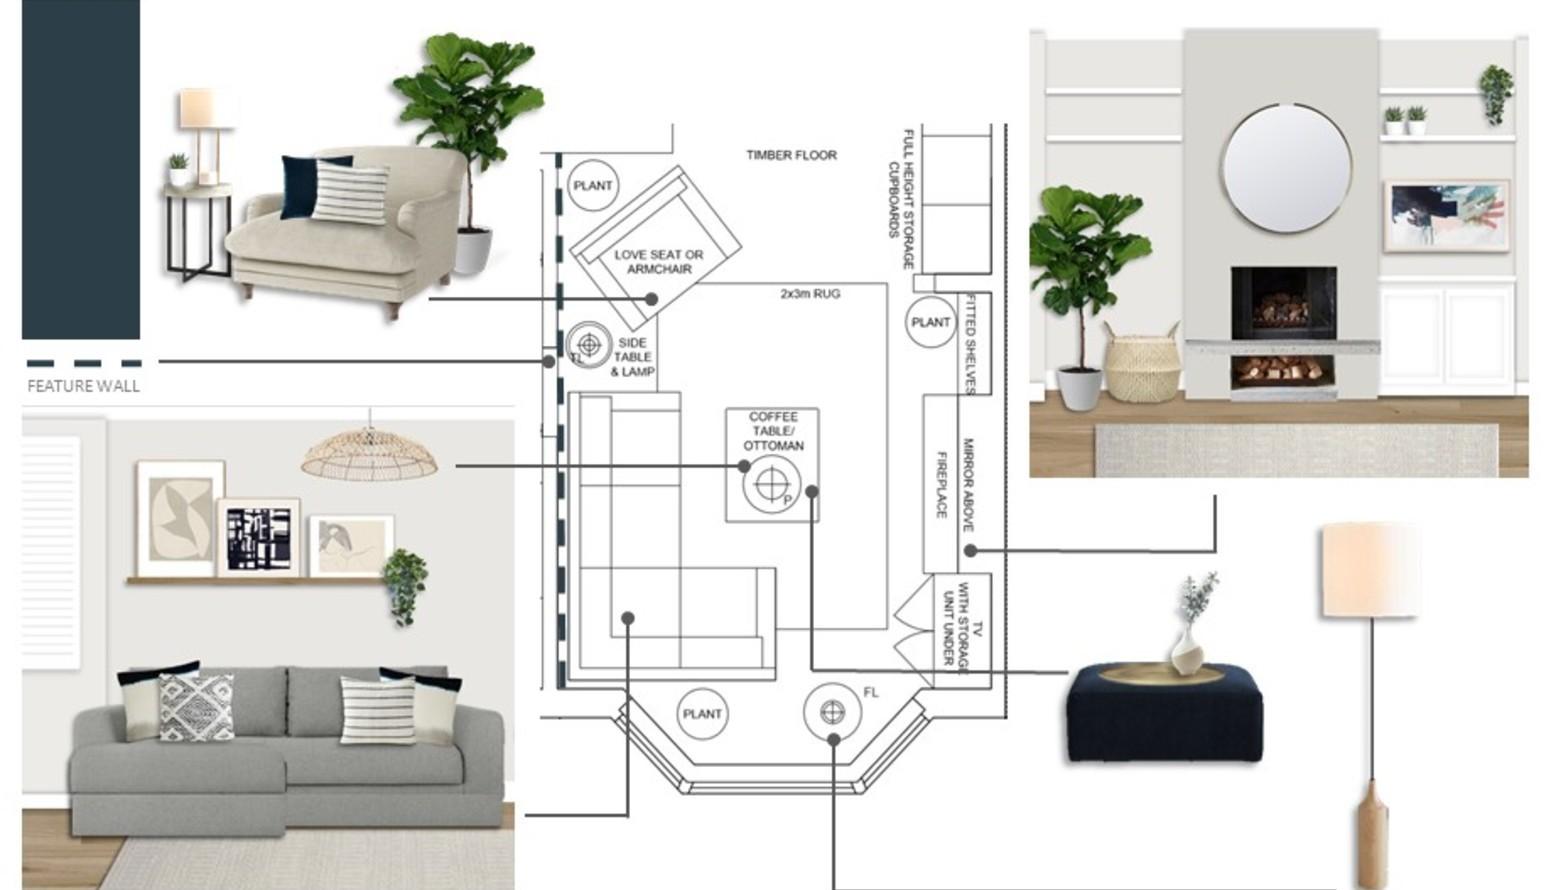 Simona miniace living room plan